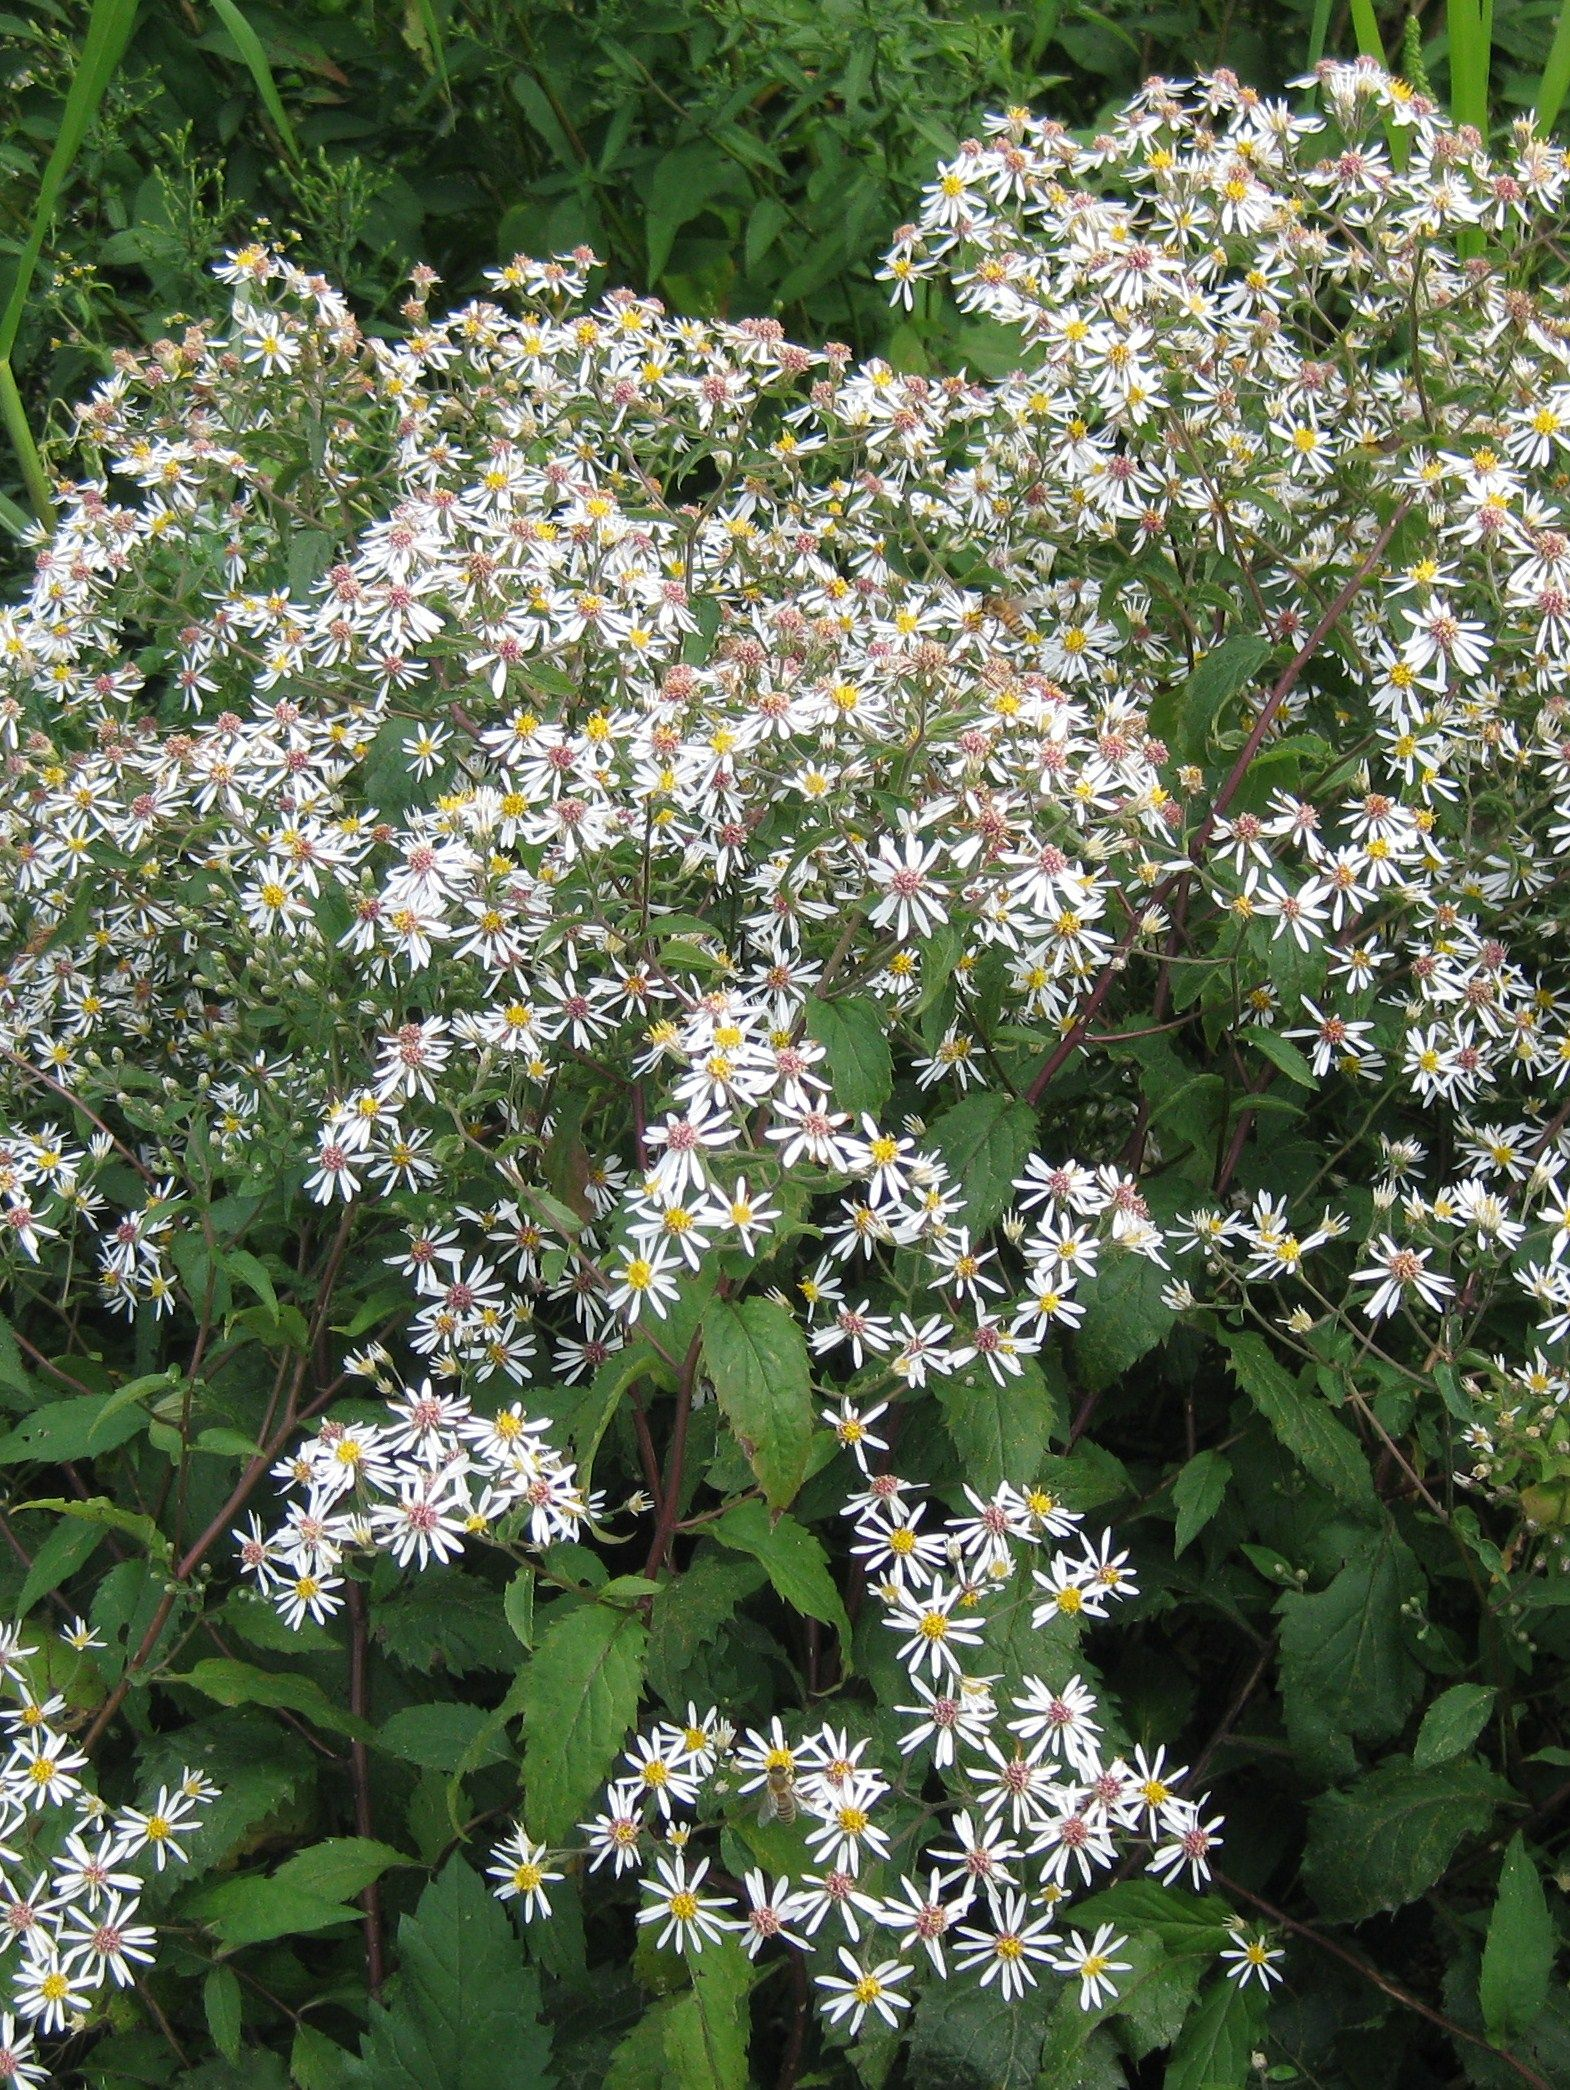 Eurybia Aster Divaricata White Wood Aster Abundant White Flowers